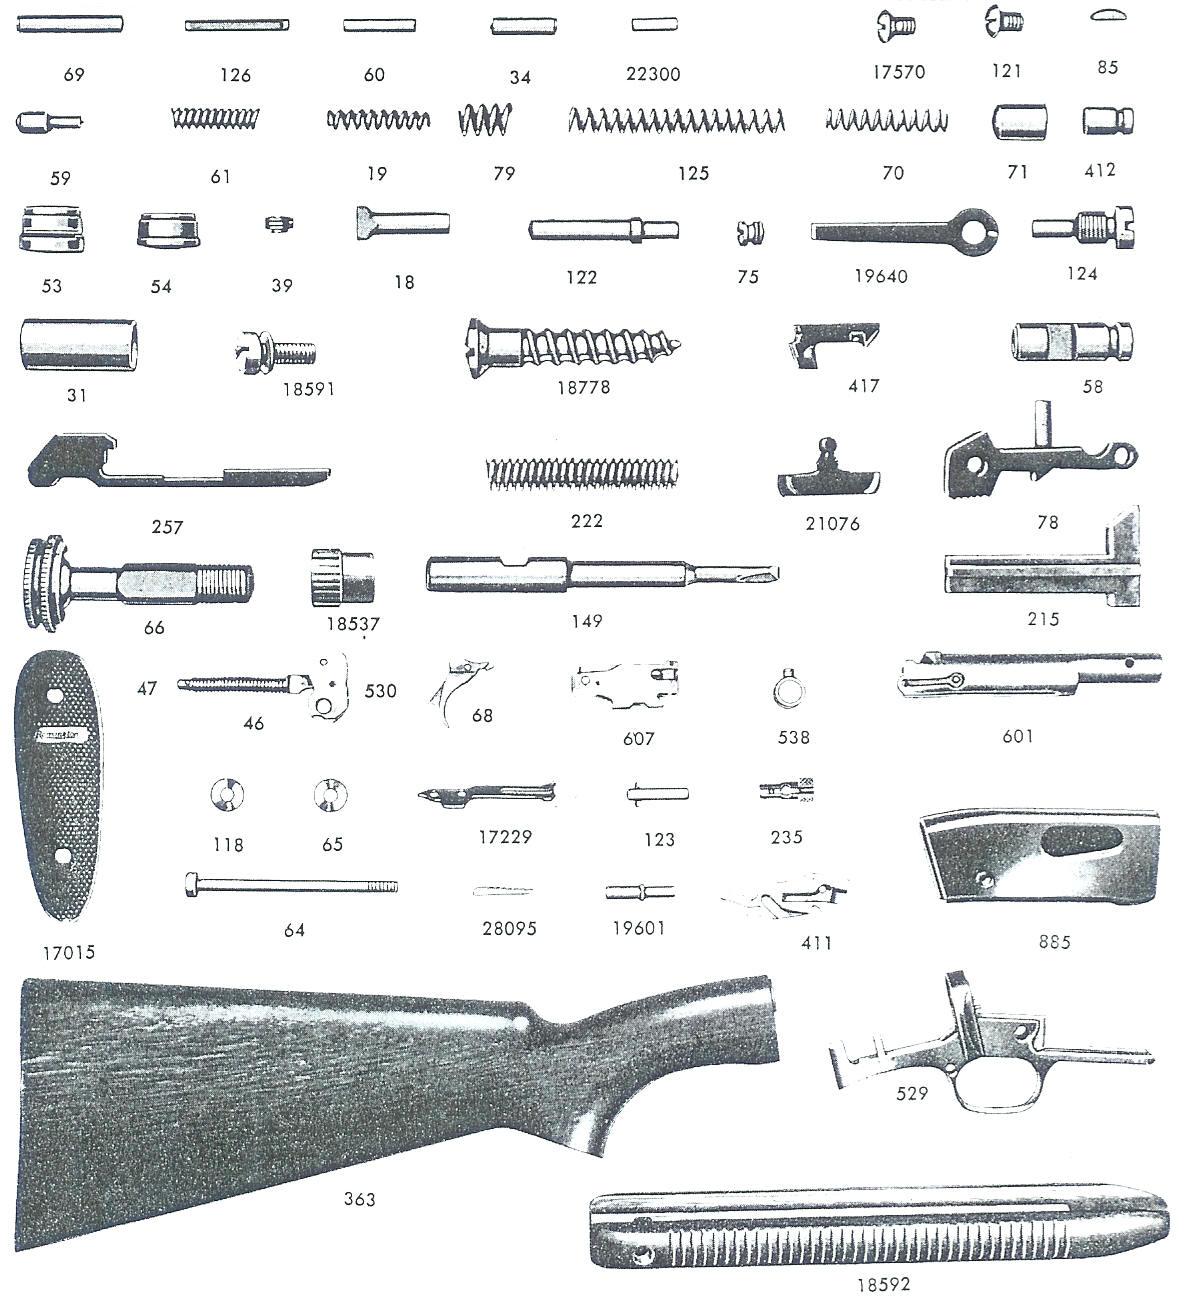 Remington Model 742 Disassembly Diagram Remington870partsdiagram Nylon 66 Parts